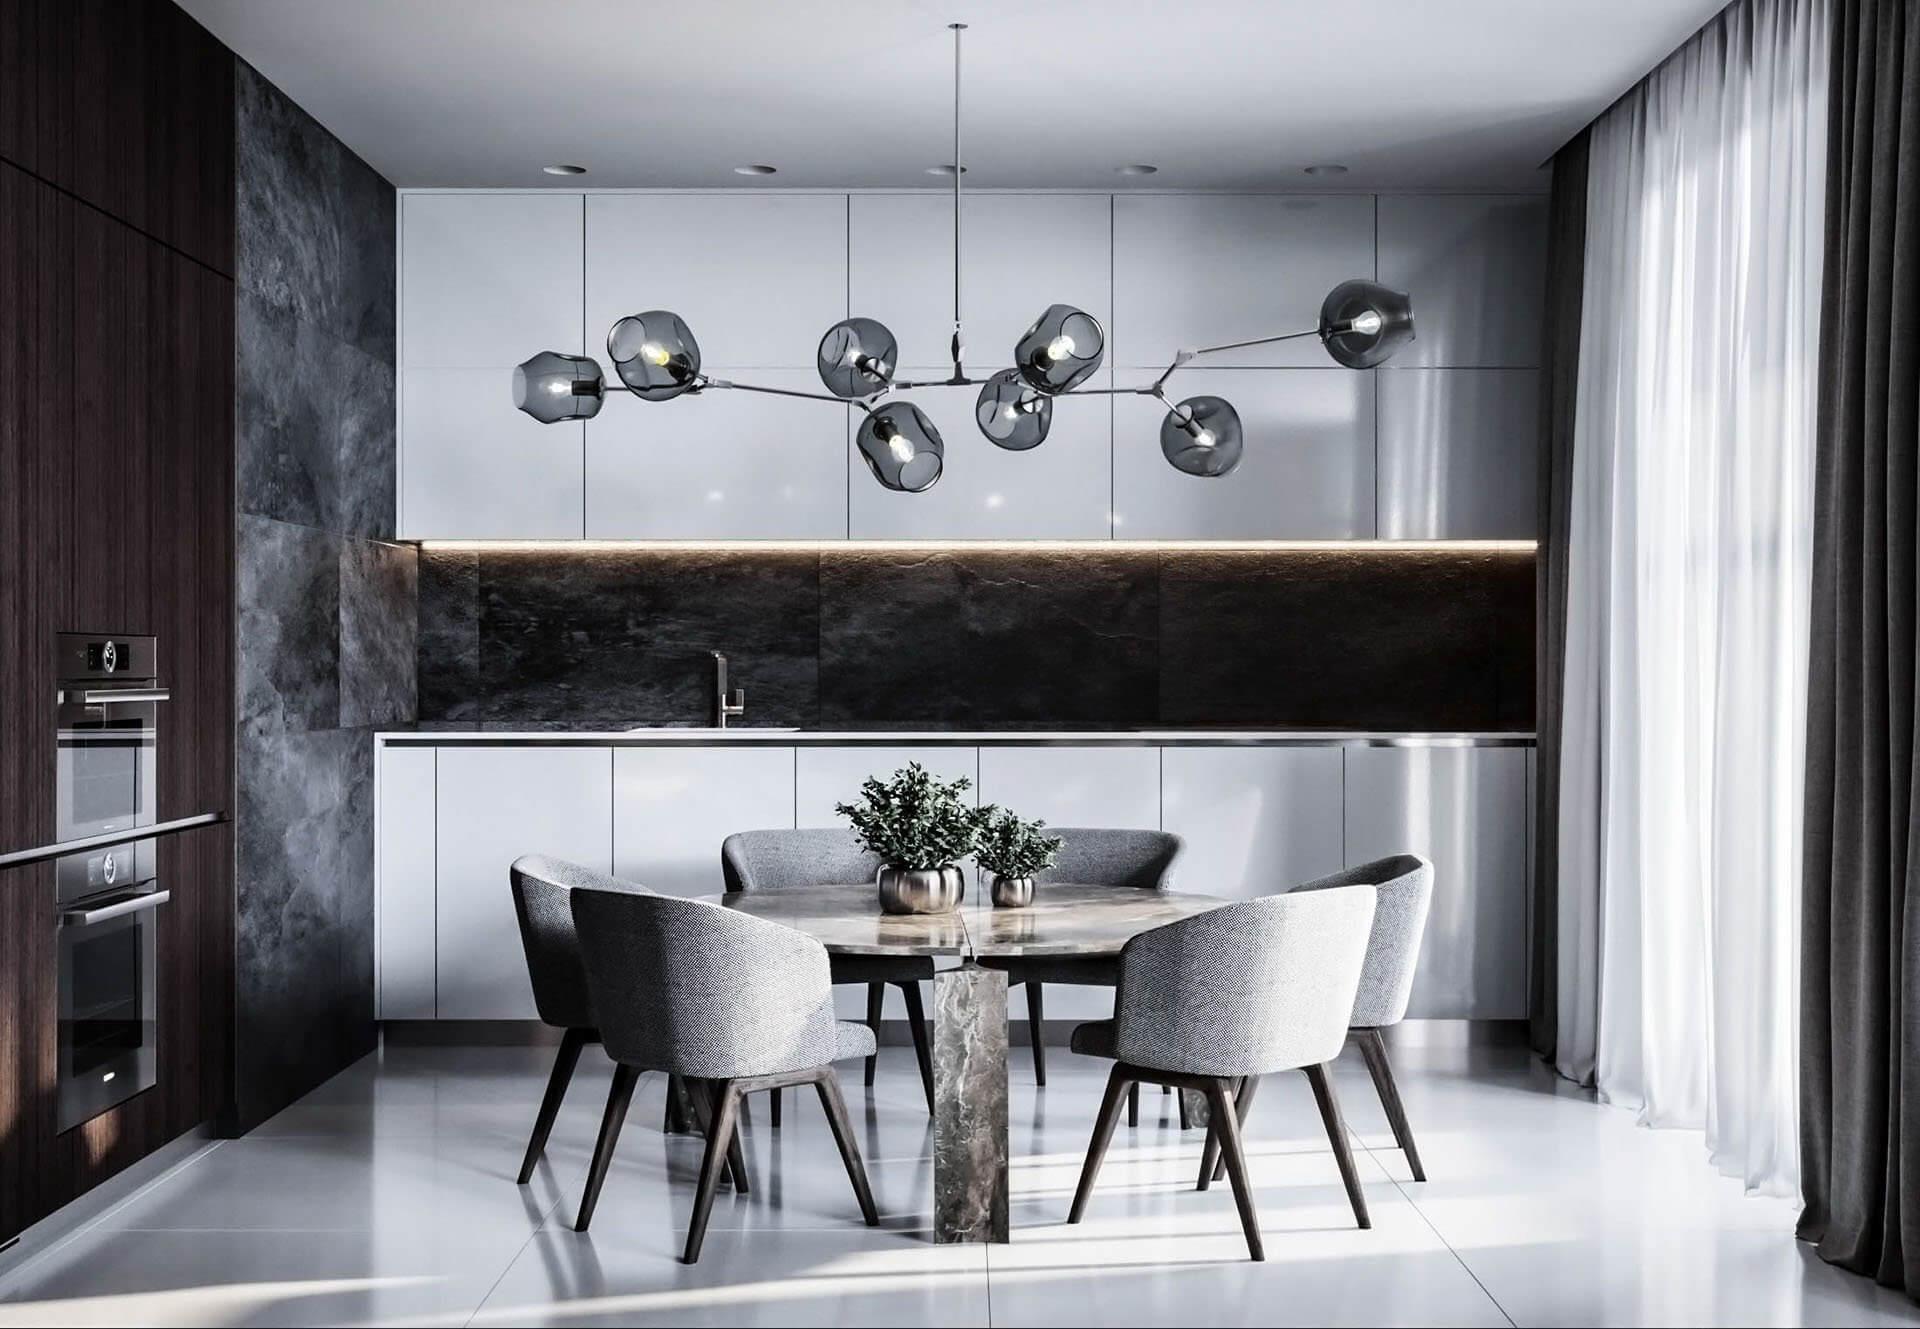 Dubrovka apartment sideboard kitchen - cgi visualizatiomn